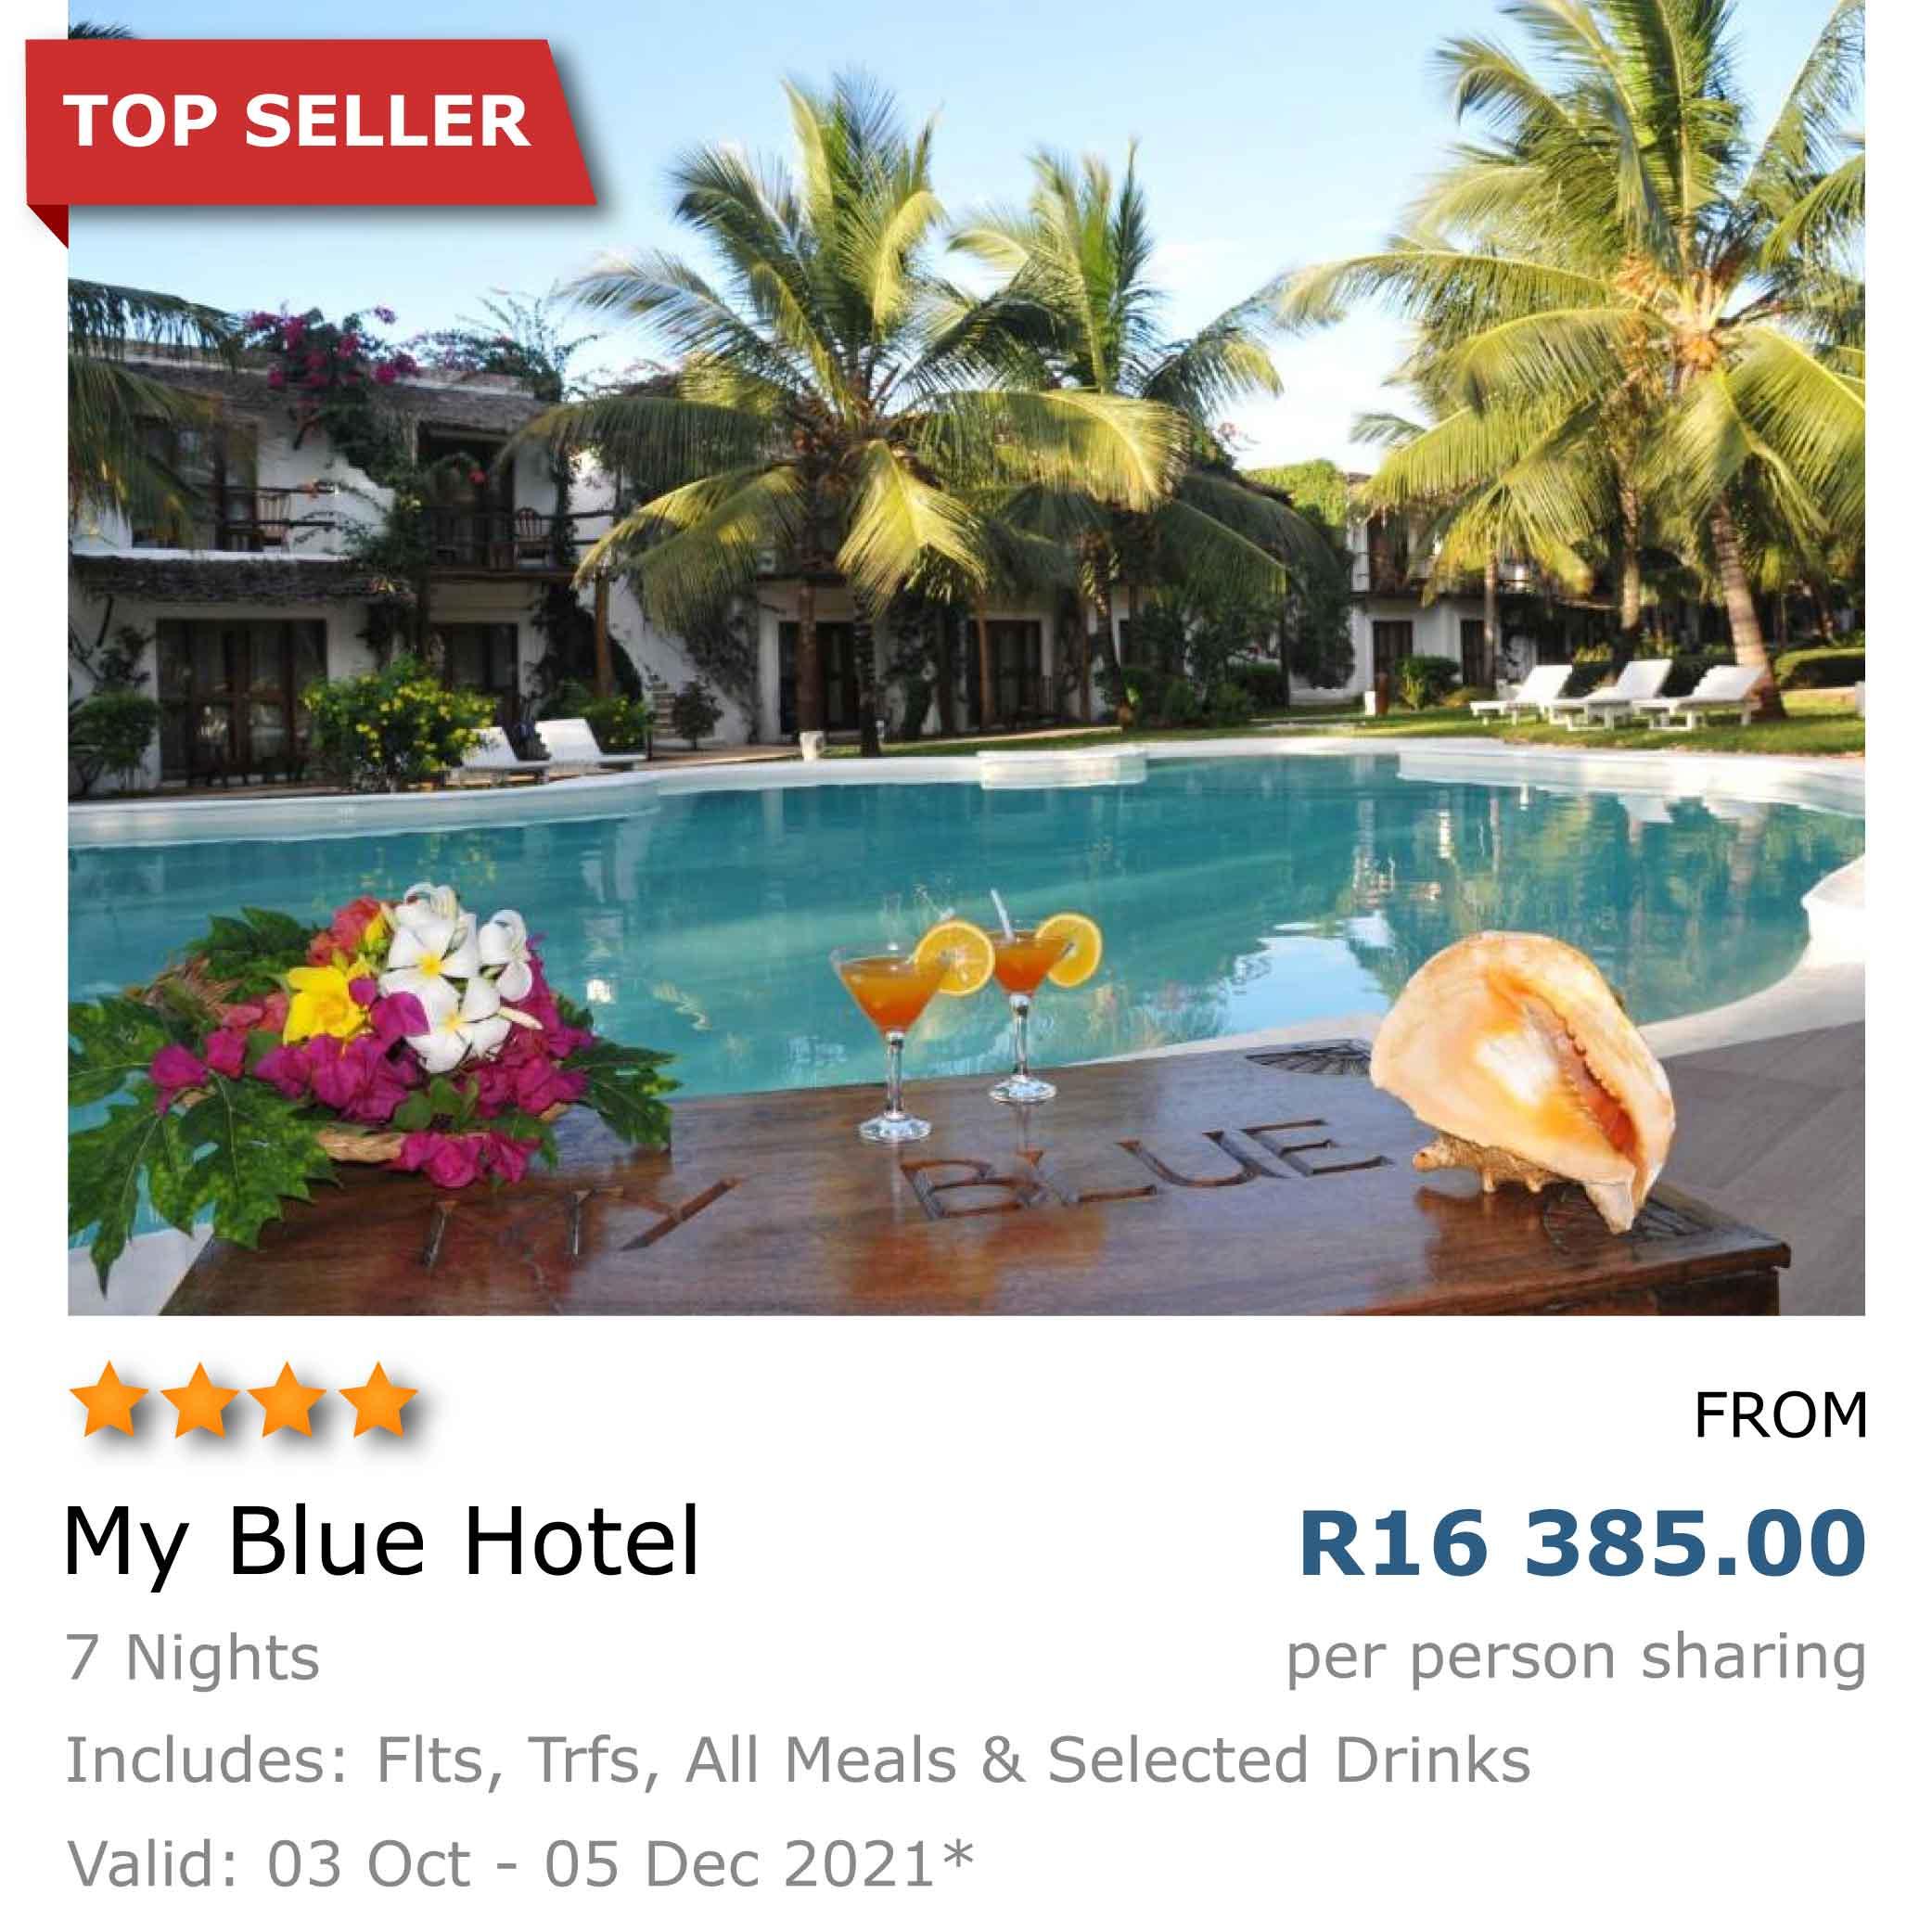 My Blue Hotel